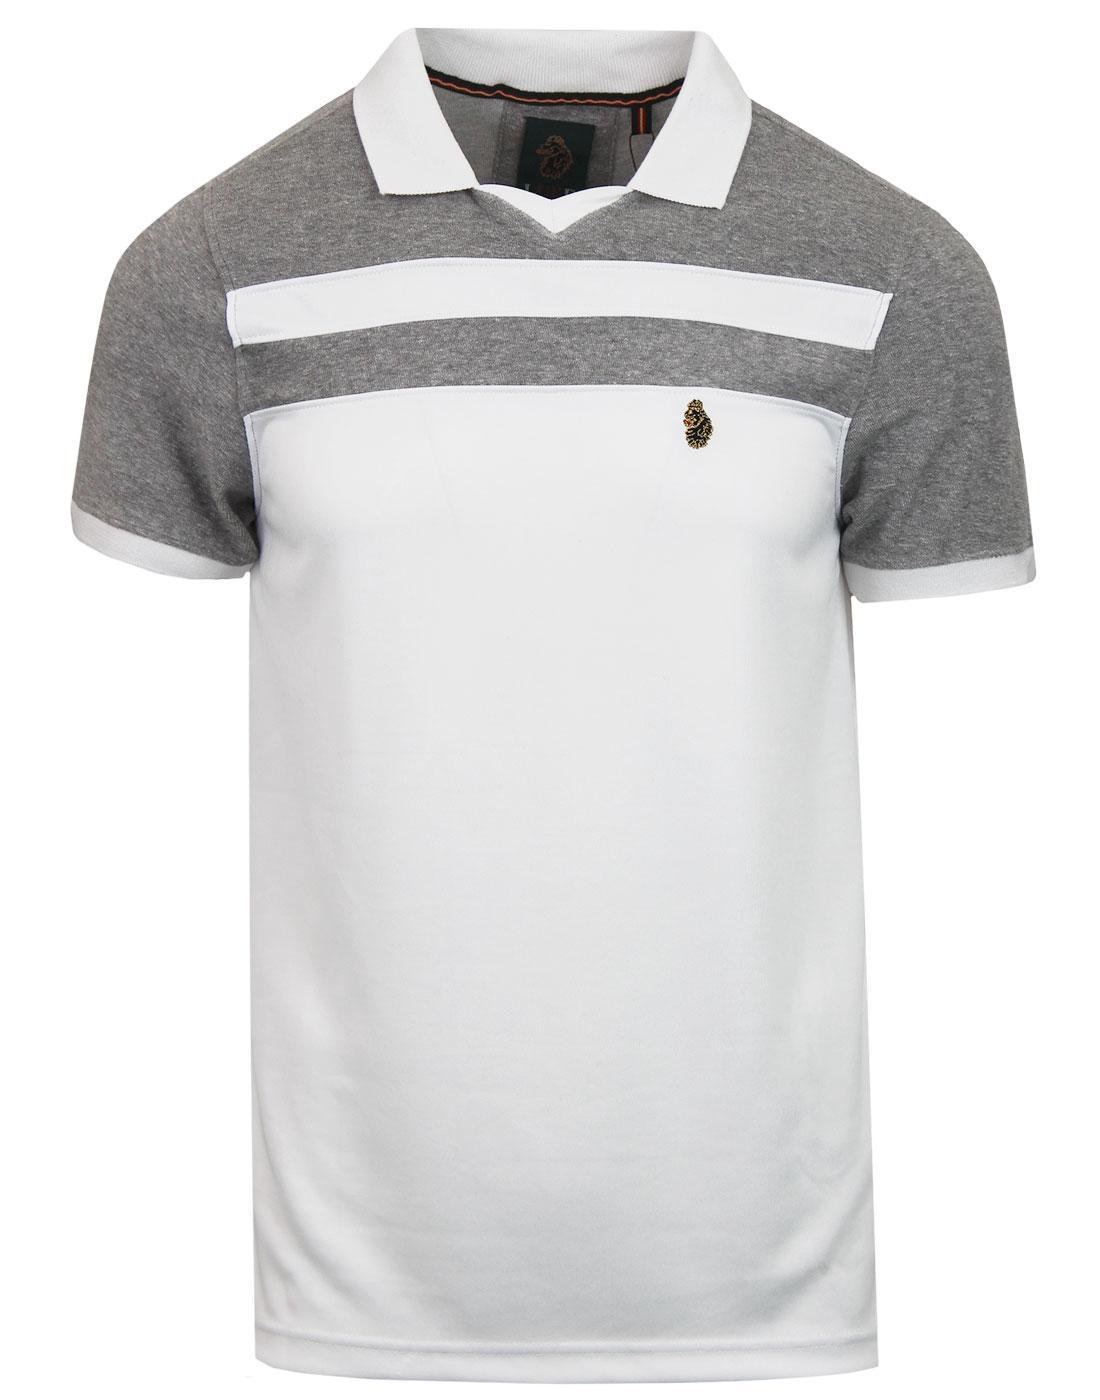 Mens England Polo Shirt Rugby Football Top Short Sleeve Lion Logo Collar Tee